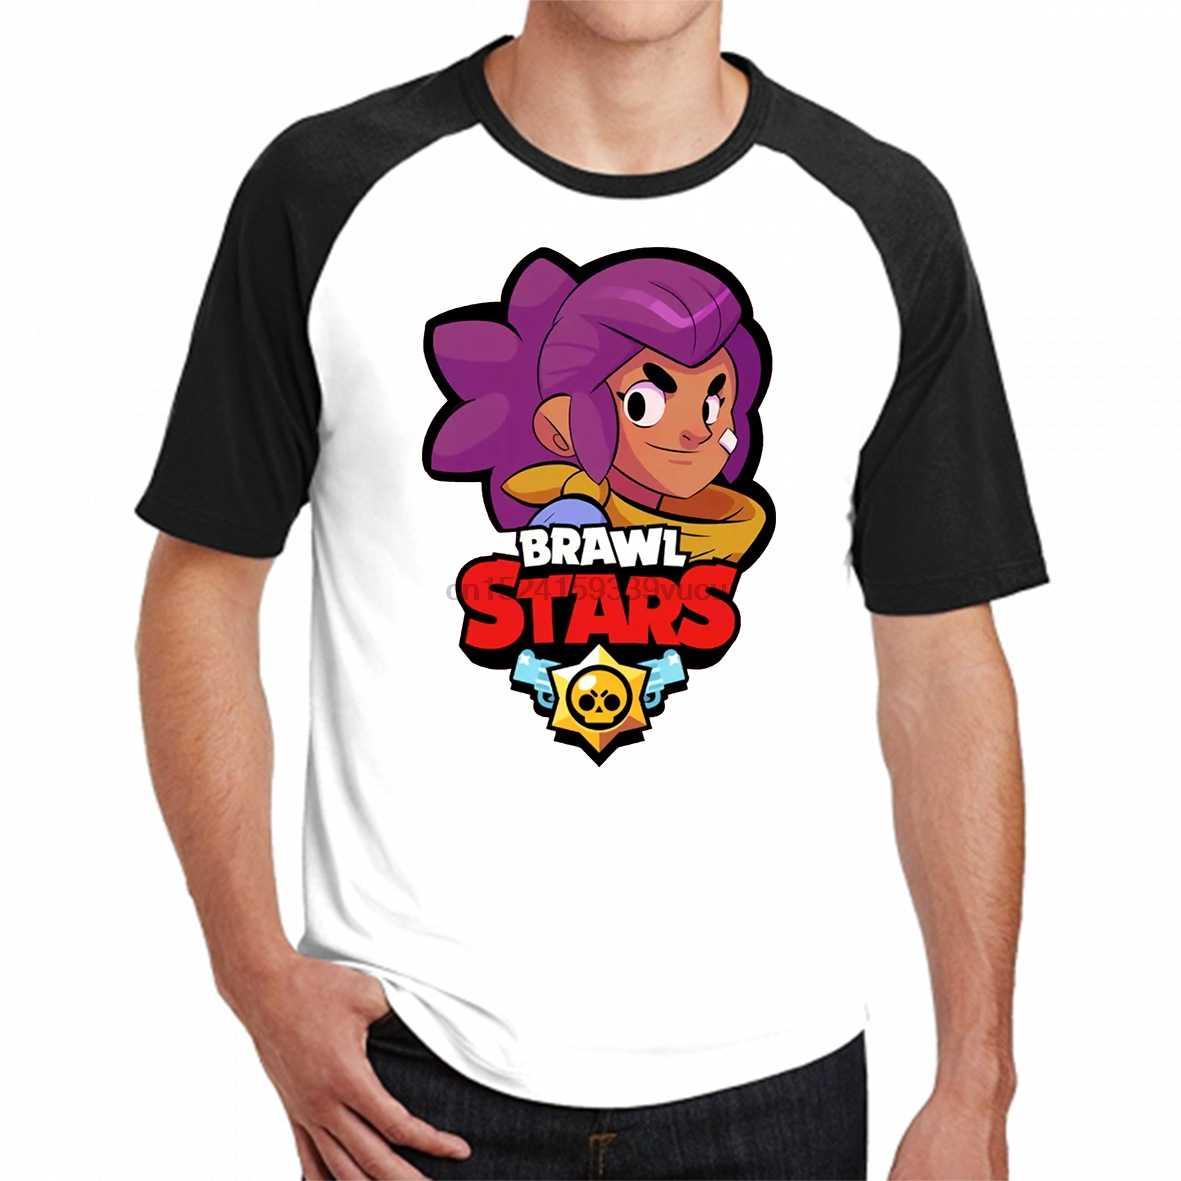 91035ae874f Mens Designer T Shirts Sale 2019 Shelly Brawl Stars Men Tee Shirt Online  Summer Mens Black